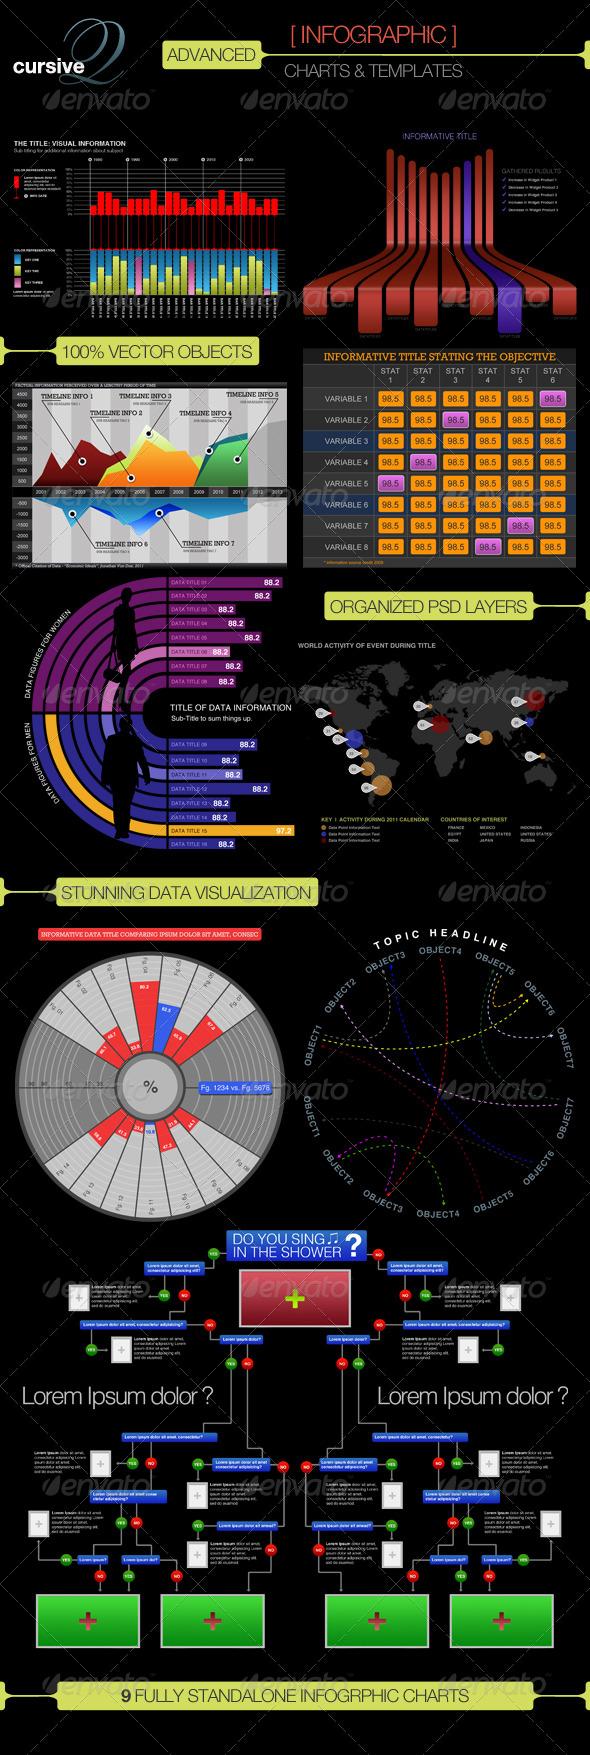 Advanced Infographic Charts by CursiveQ-Designs